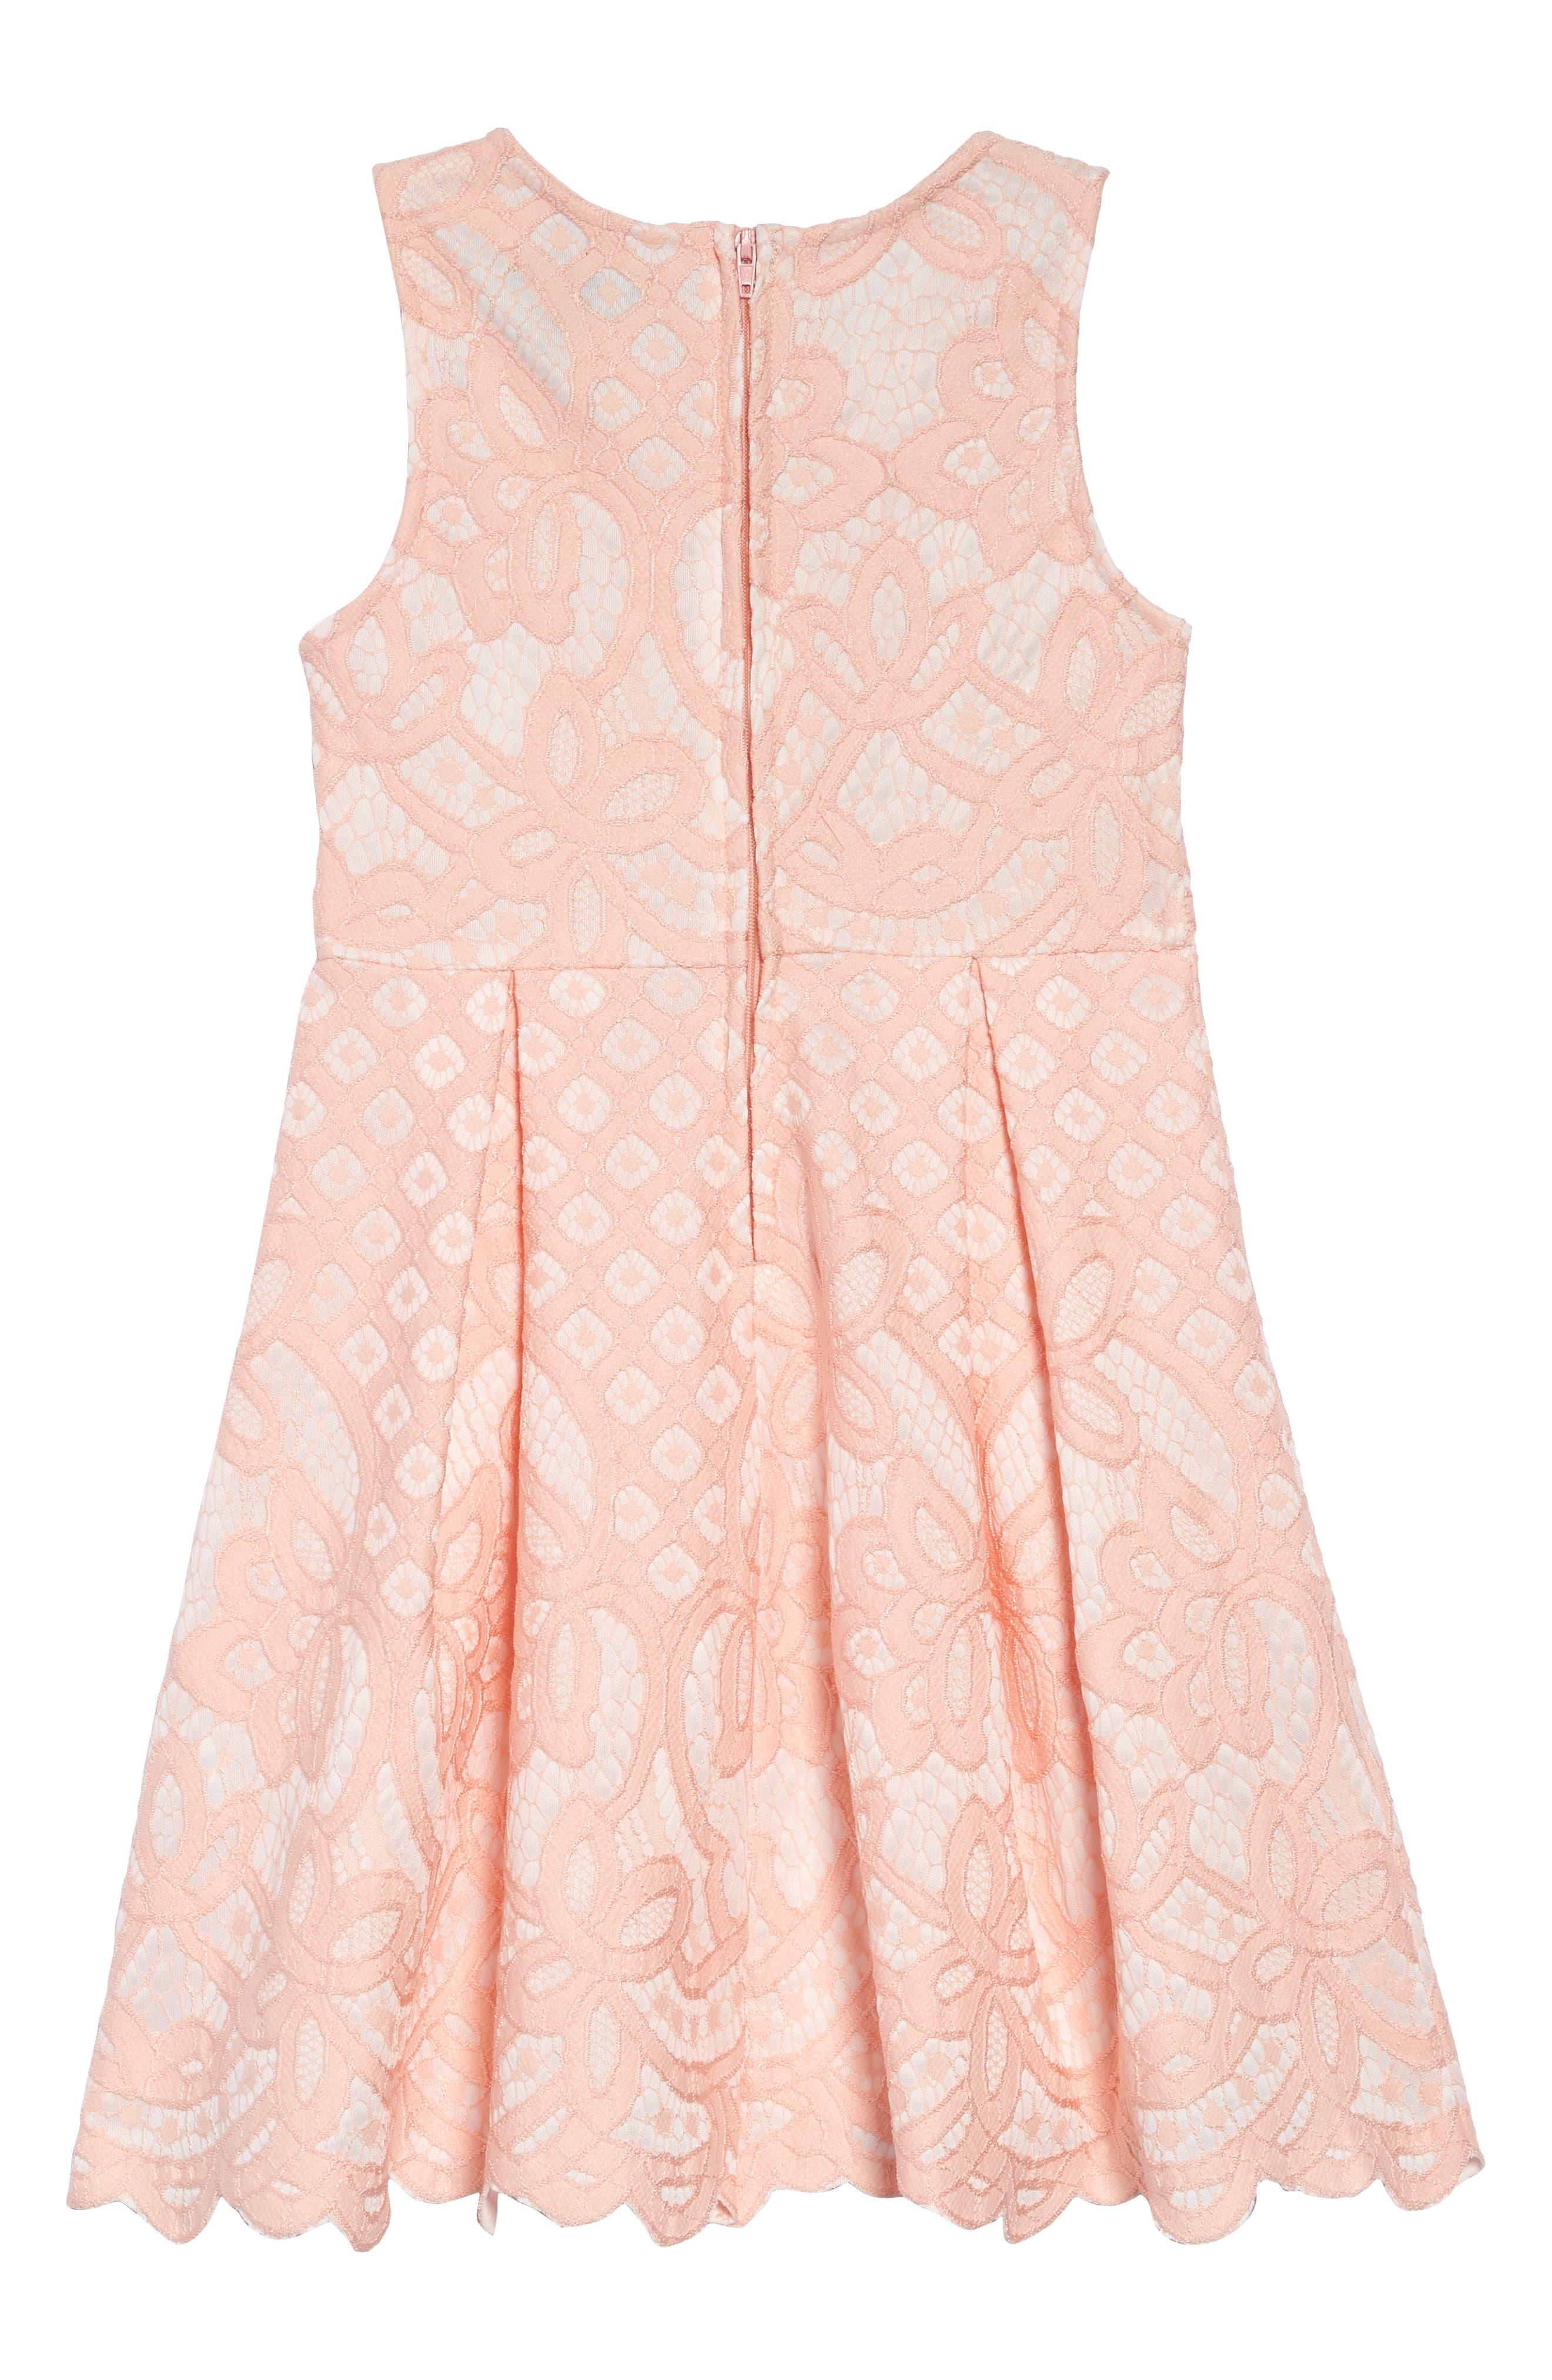 Two Tone Lace Dress,                             Alternate thumbnail 2, color,                             681